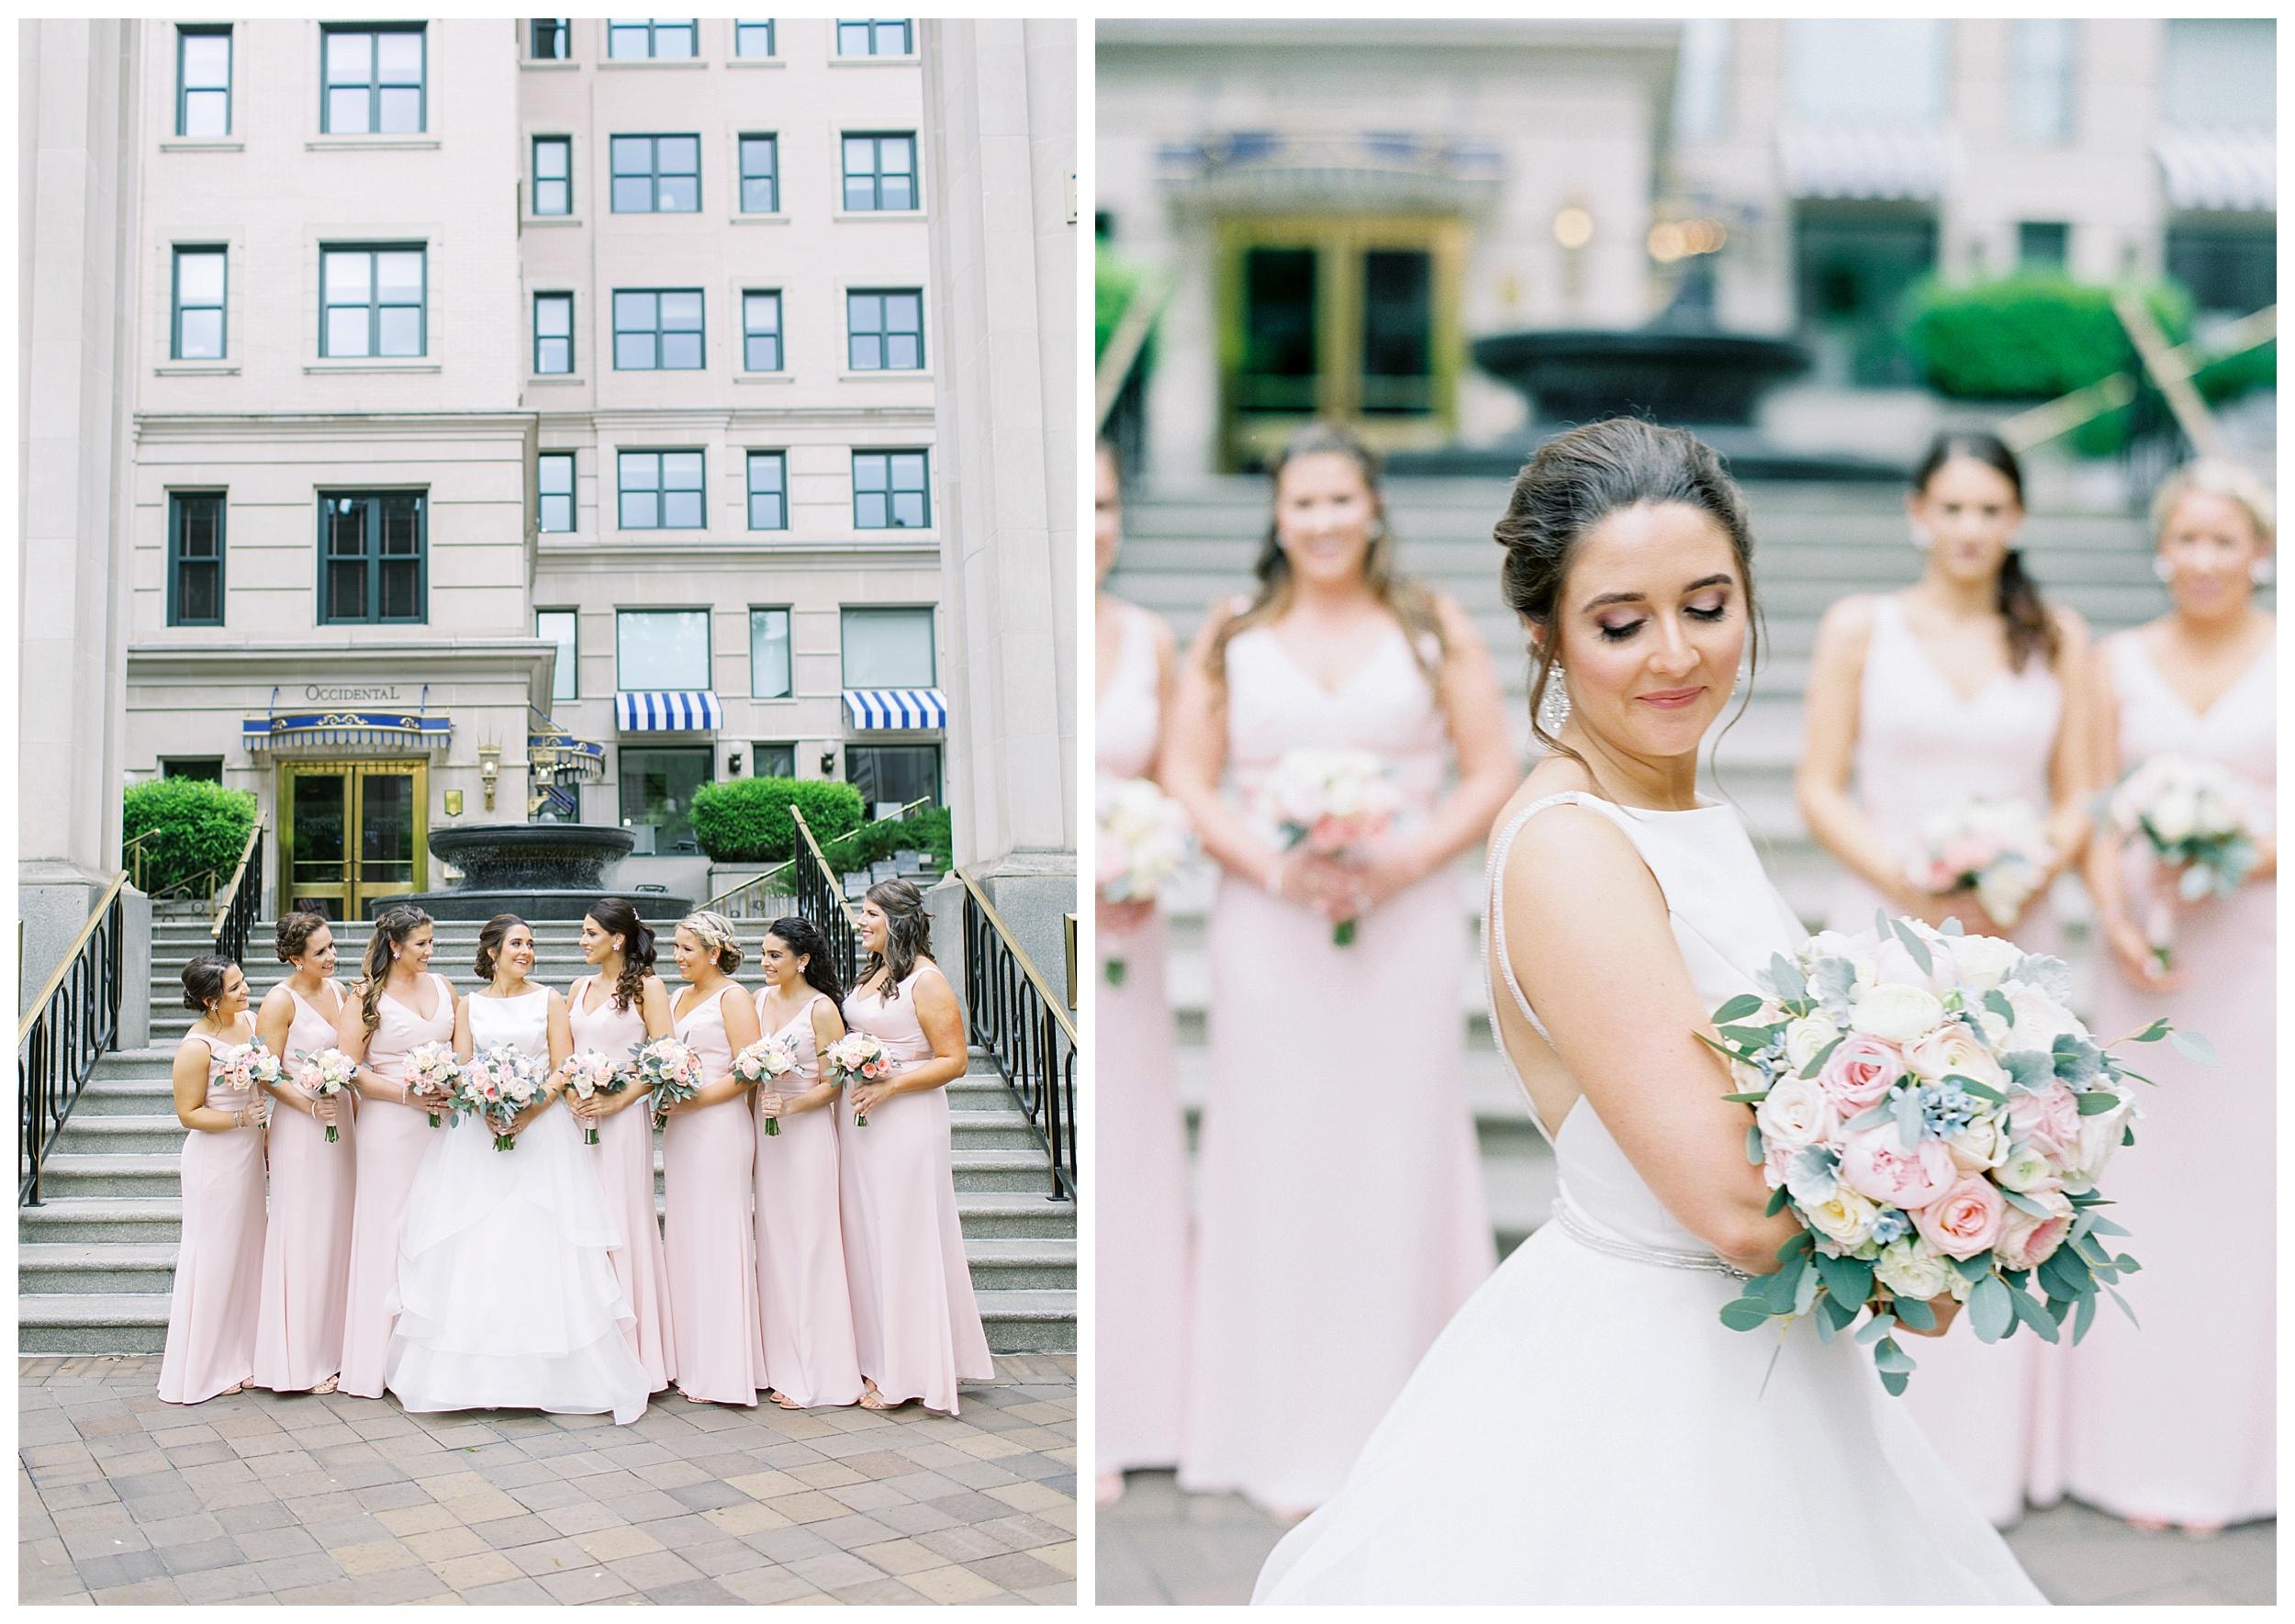 DAR Constitution Hall Wedding Wedding | Daughters of the American Revolution Wedding | District of Columbia Film Wedding Photographer Kir Tuben_0032.jpg